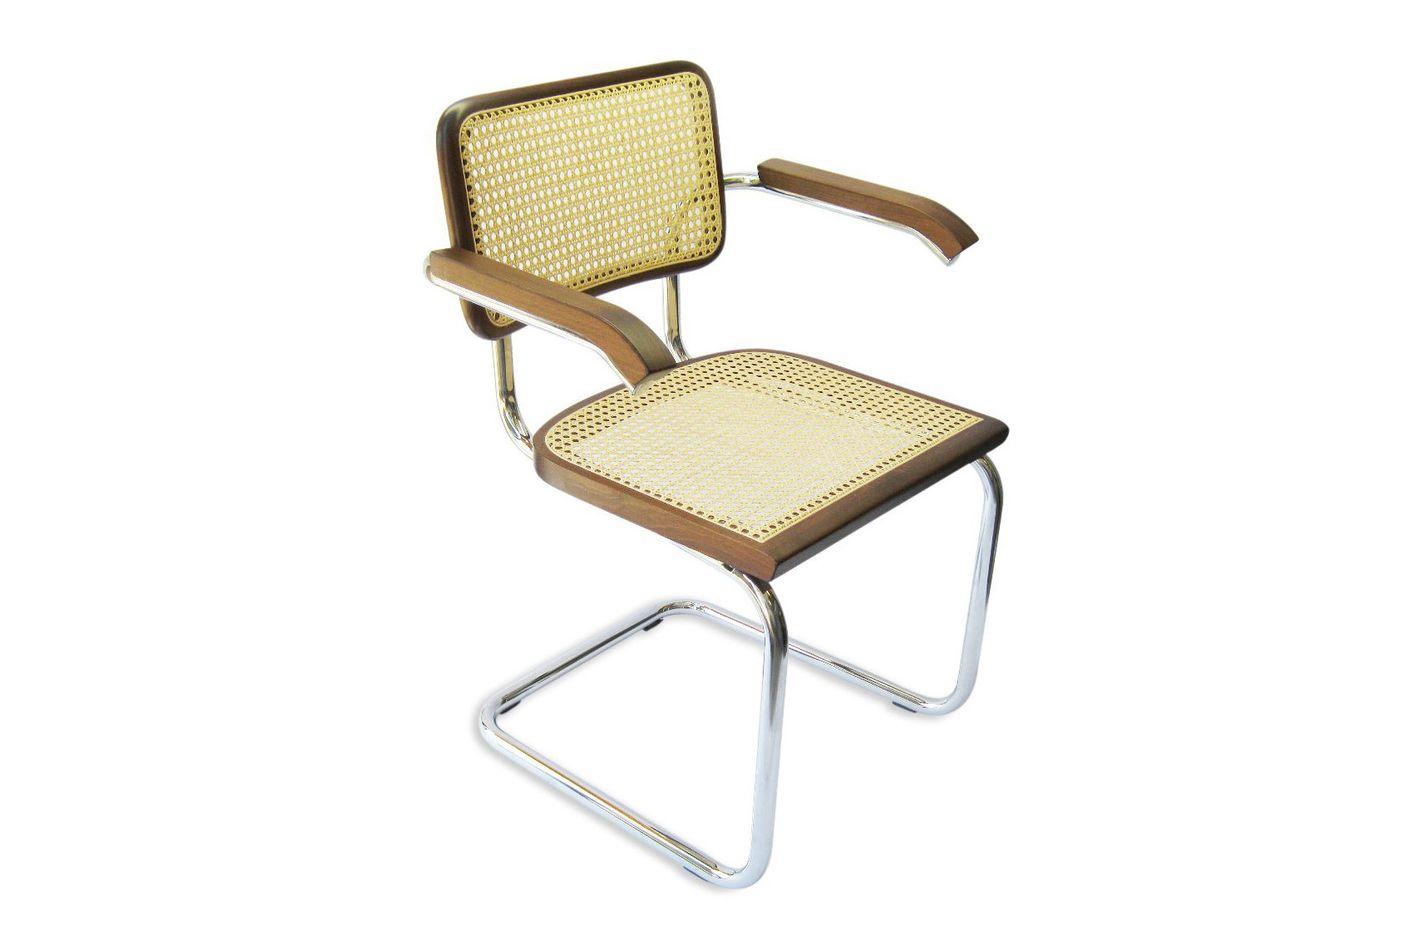 Breuer Cesca Cane Chairs